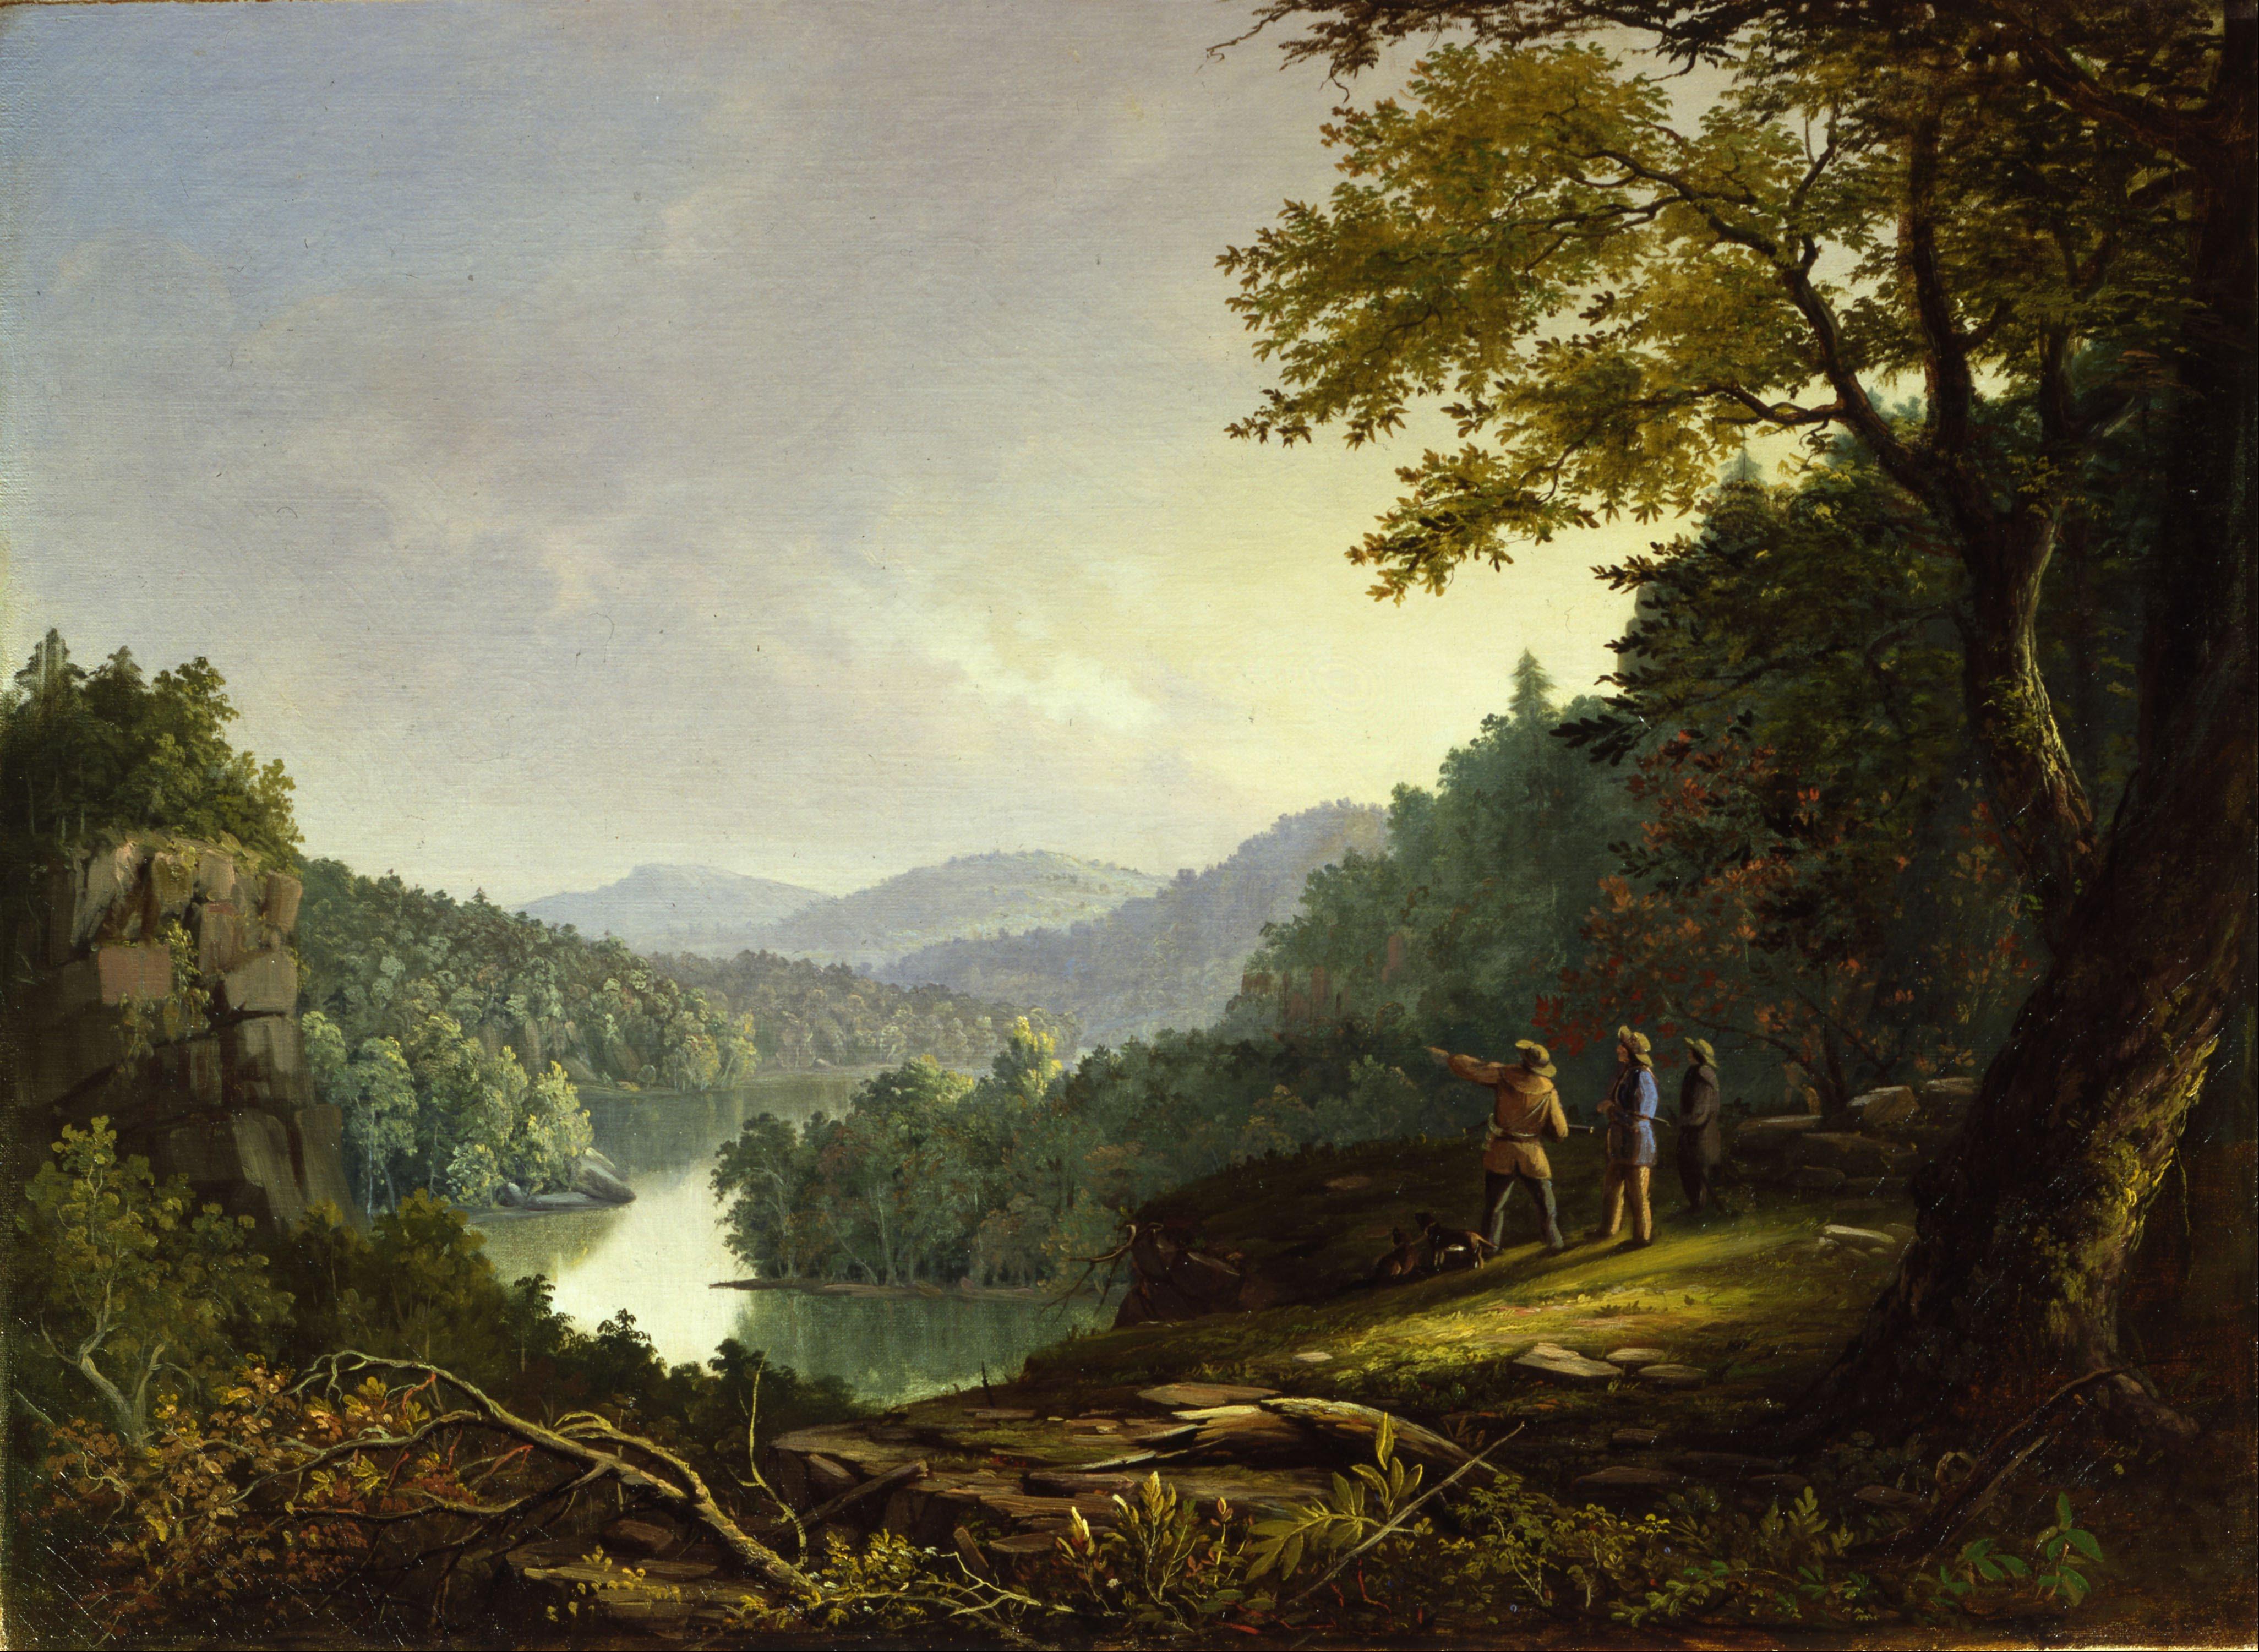 James Pierce Barton Kentucky Landscape, 1832. Currently at Cincinnati Museum Center at Union Terminal.